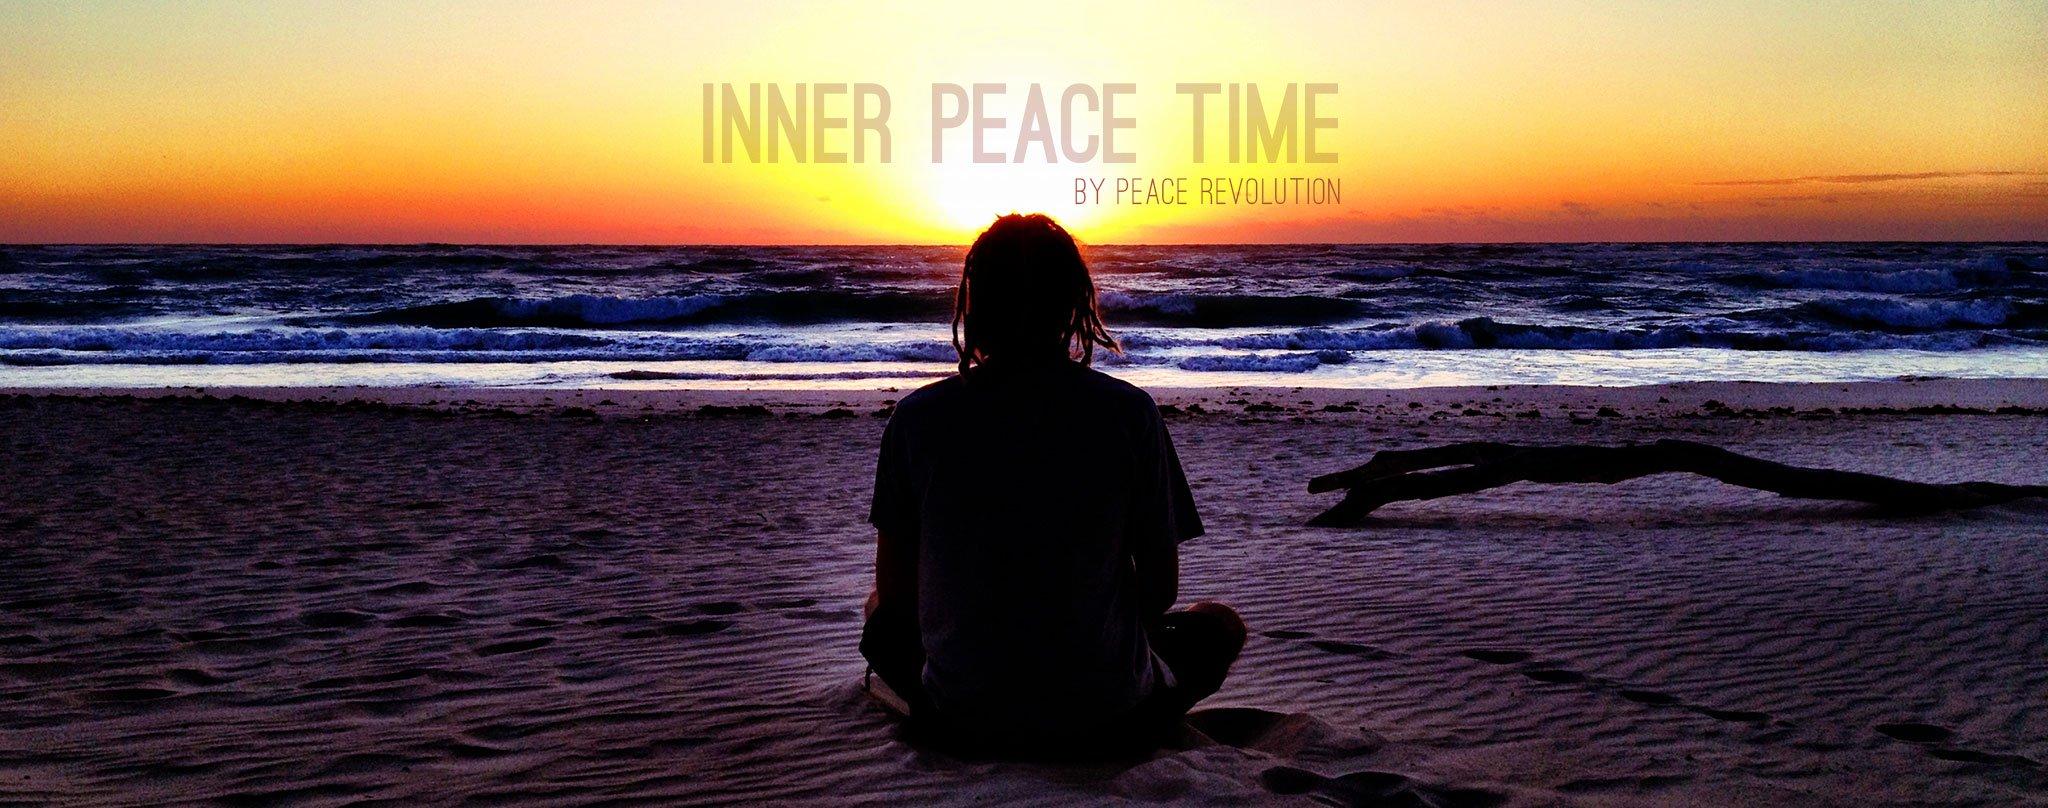 Inner Peace Time